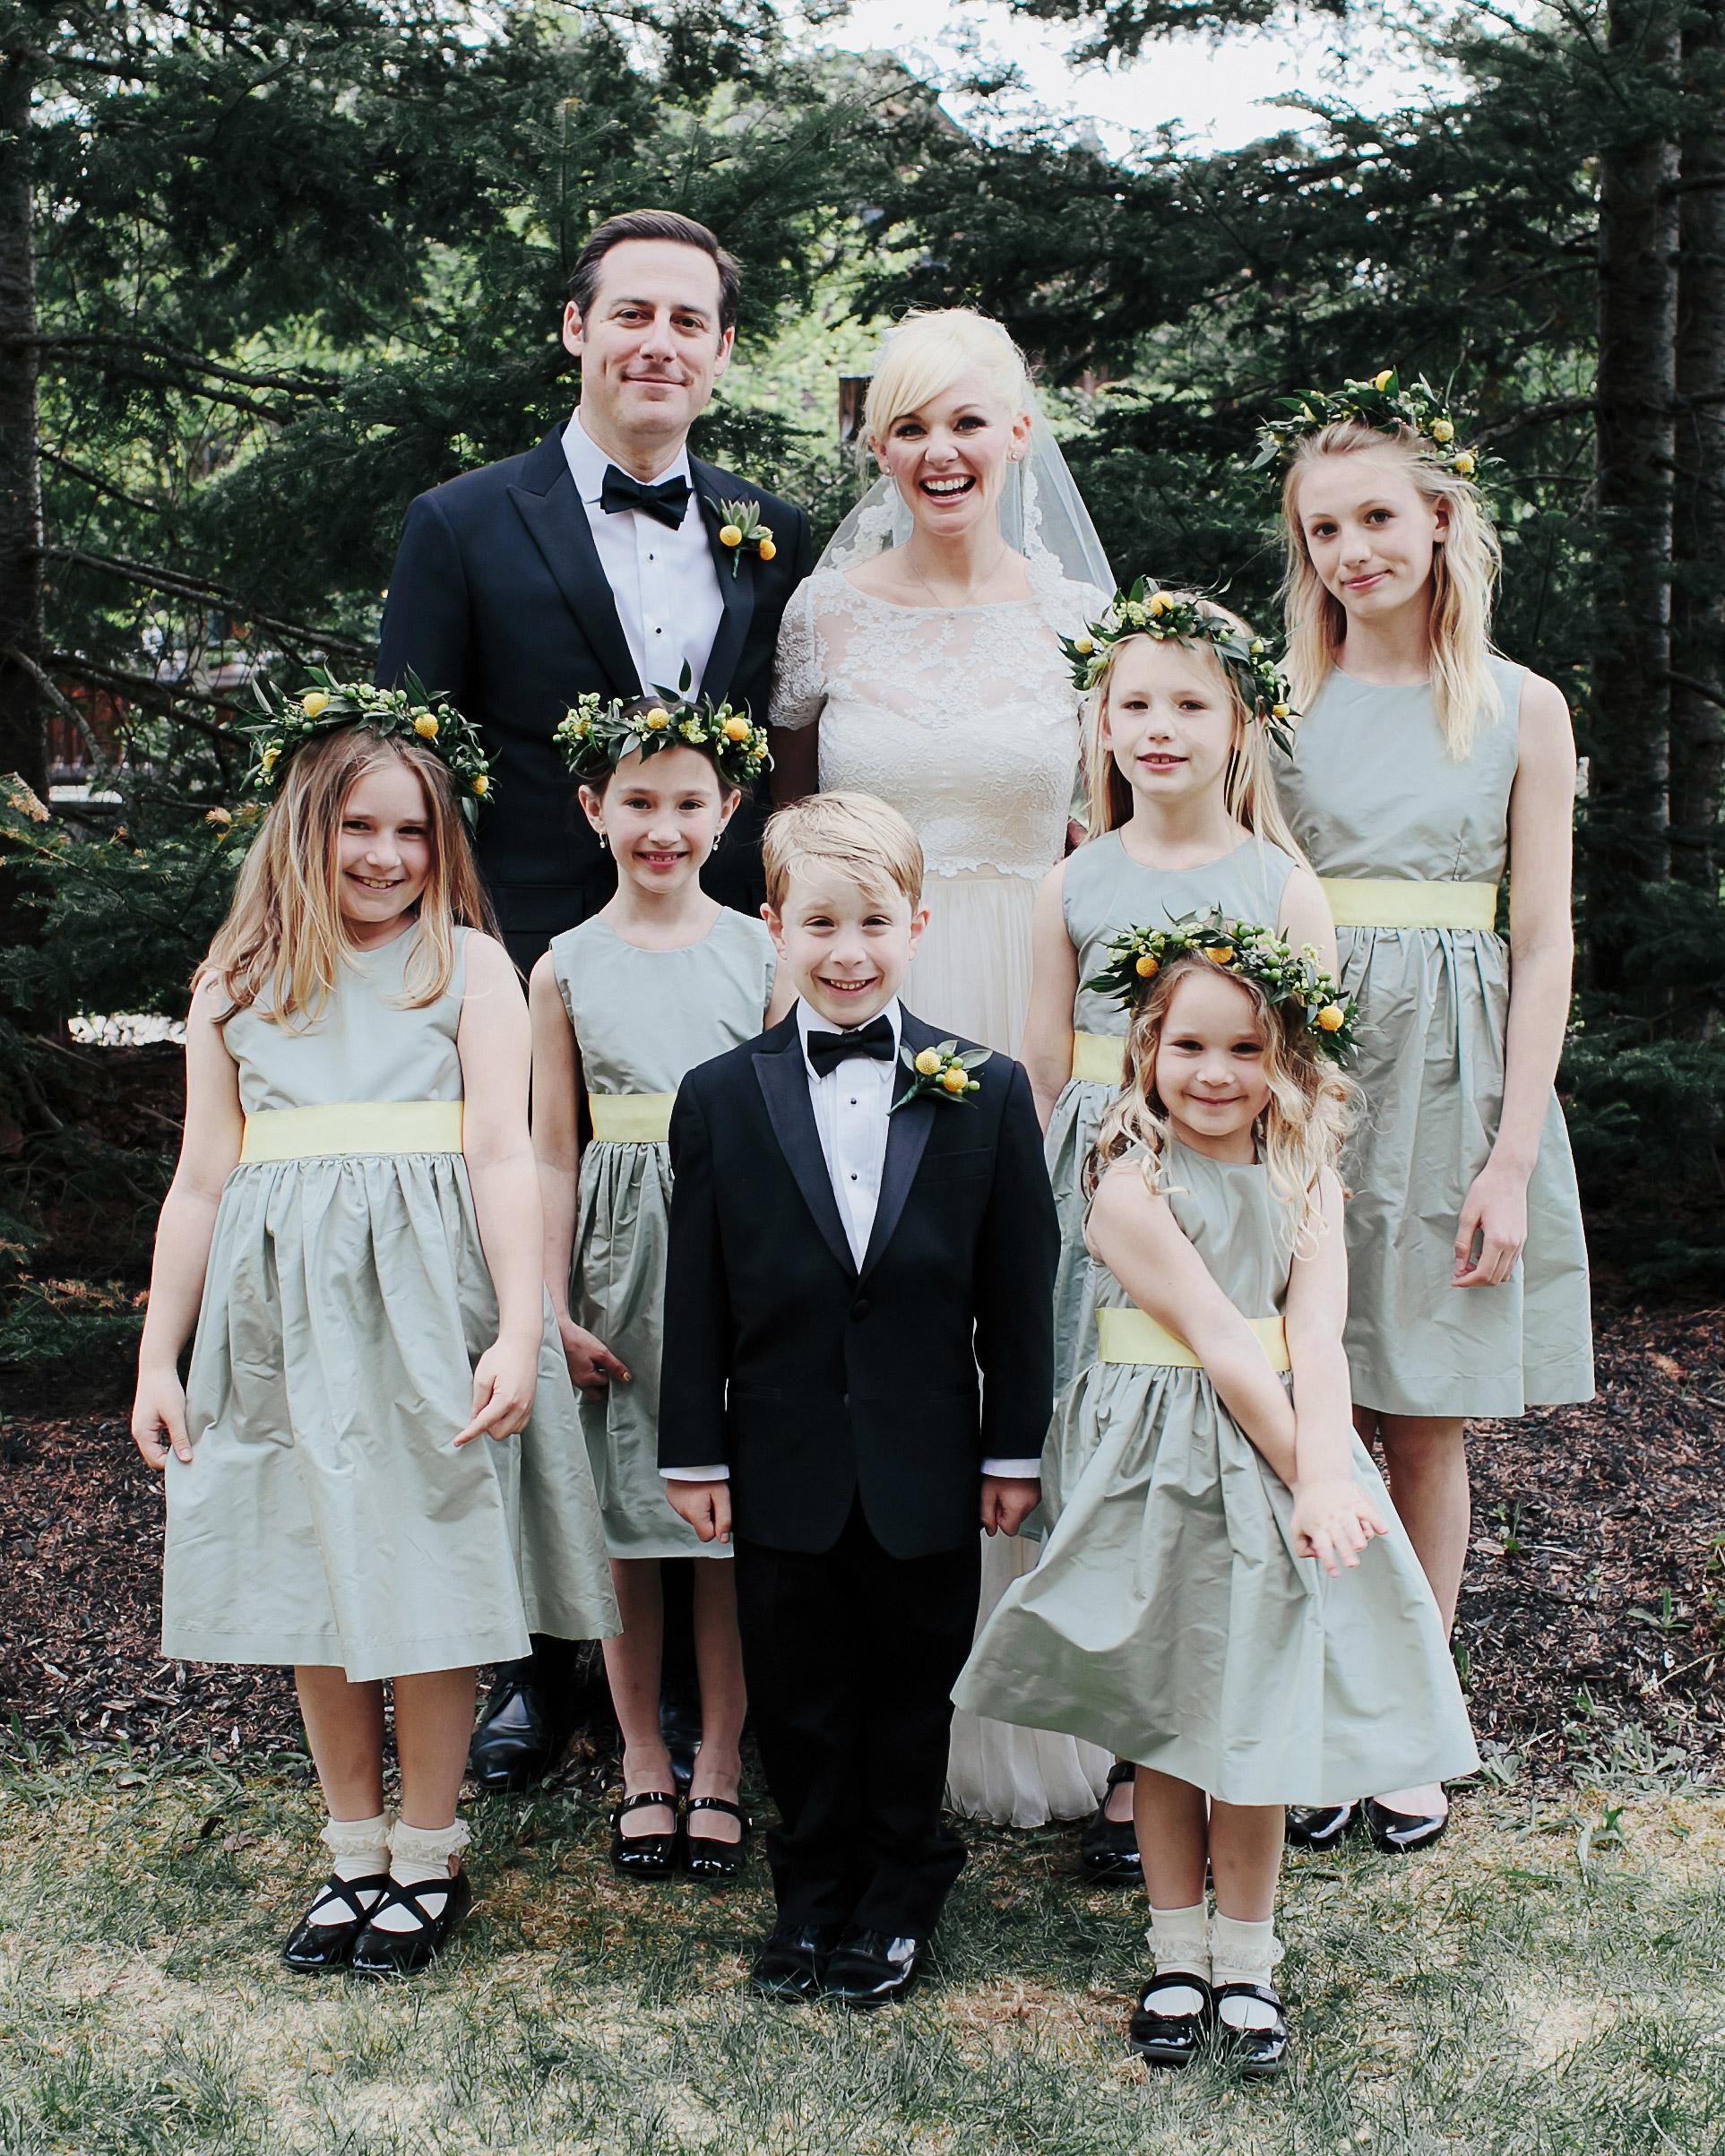 ryan-alan-wedding-kids-17-0732-s112966-0516.jpg